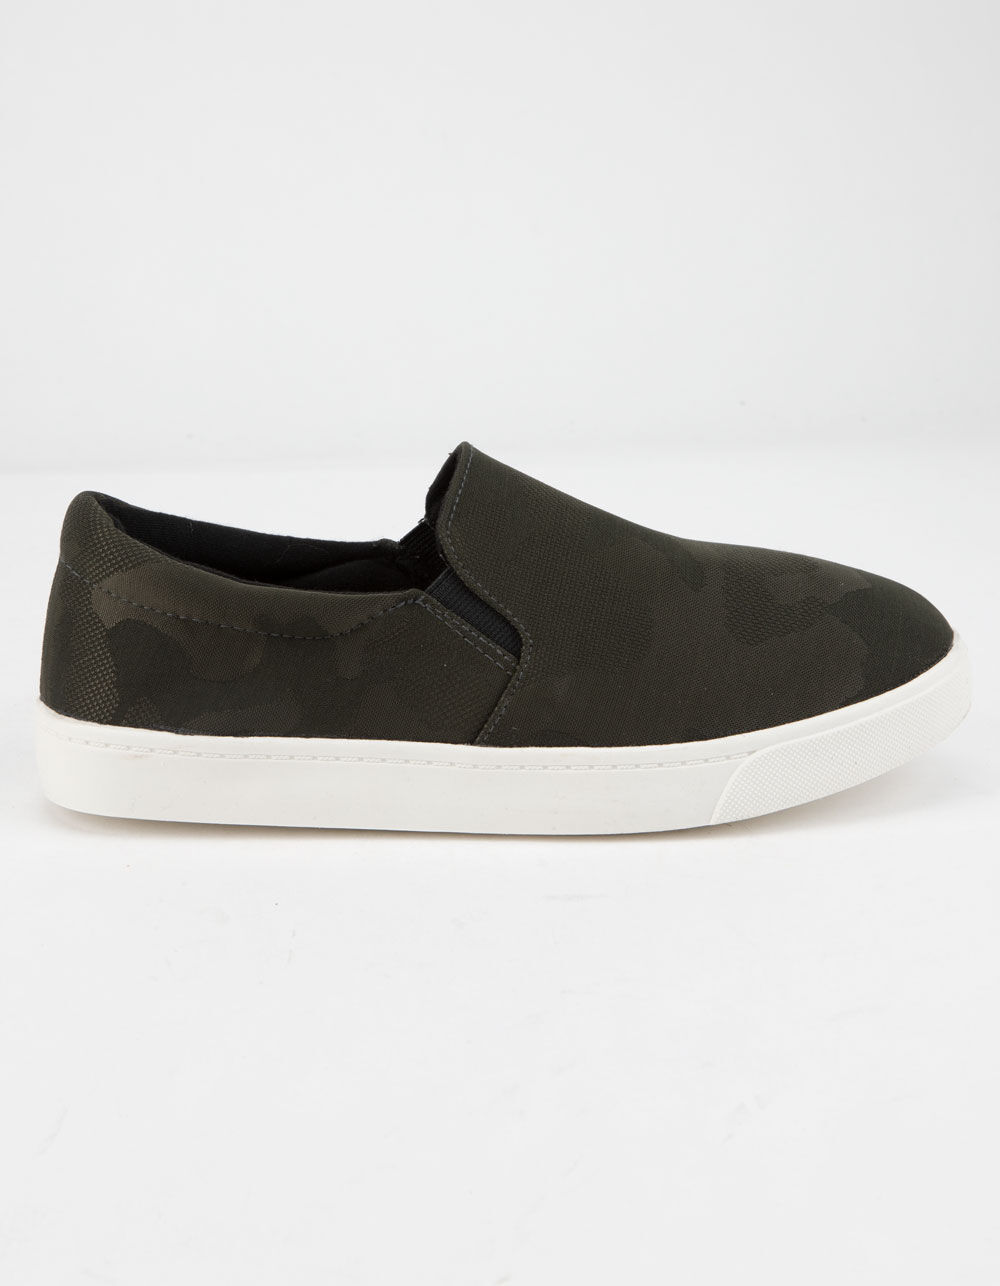 SODA Reign Camo Slip-On Shoes